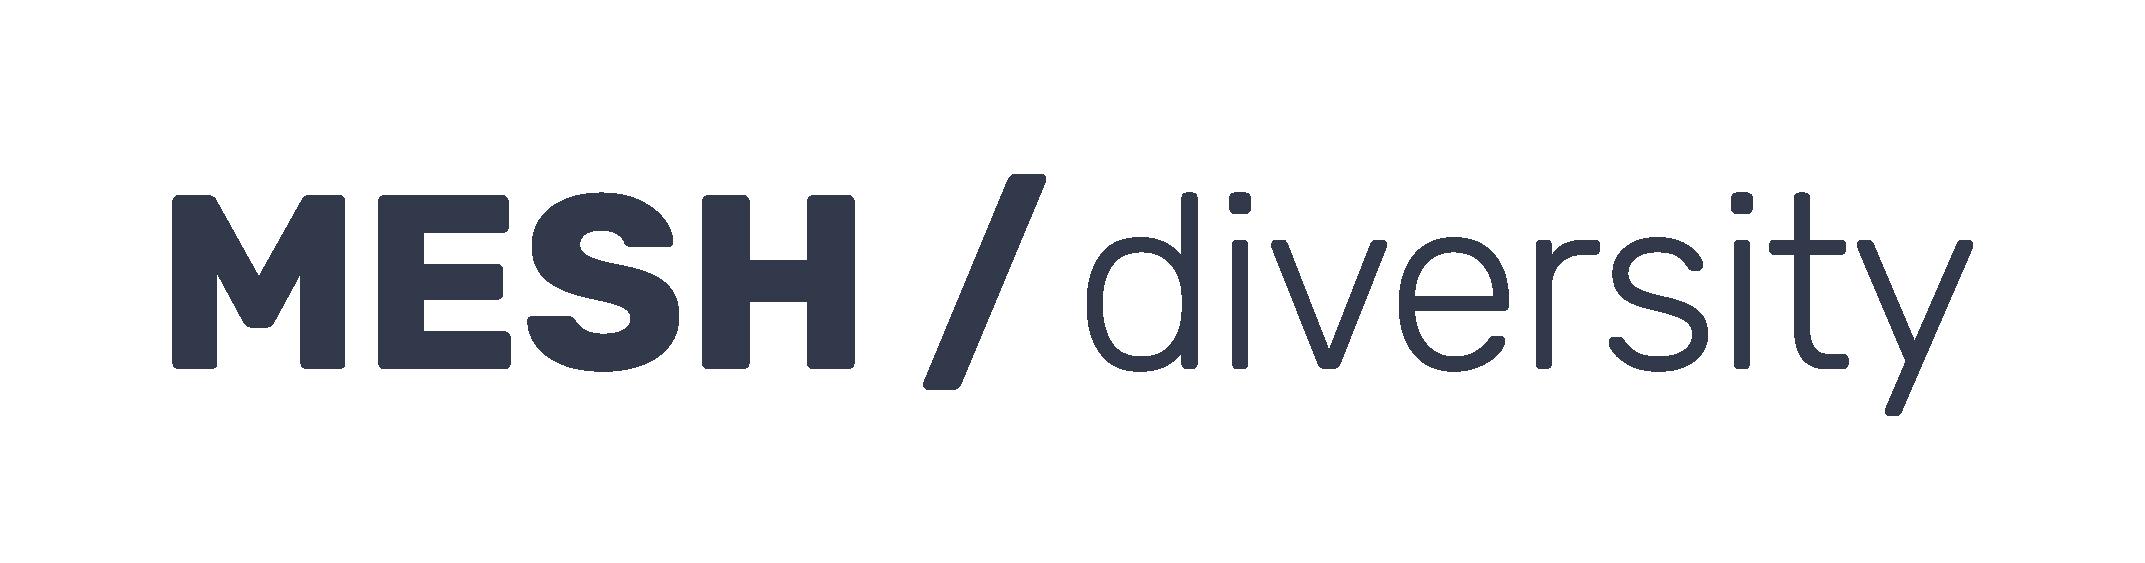 mesh_diversity.png